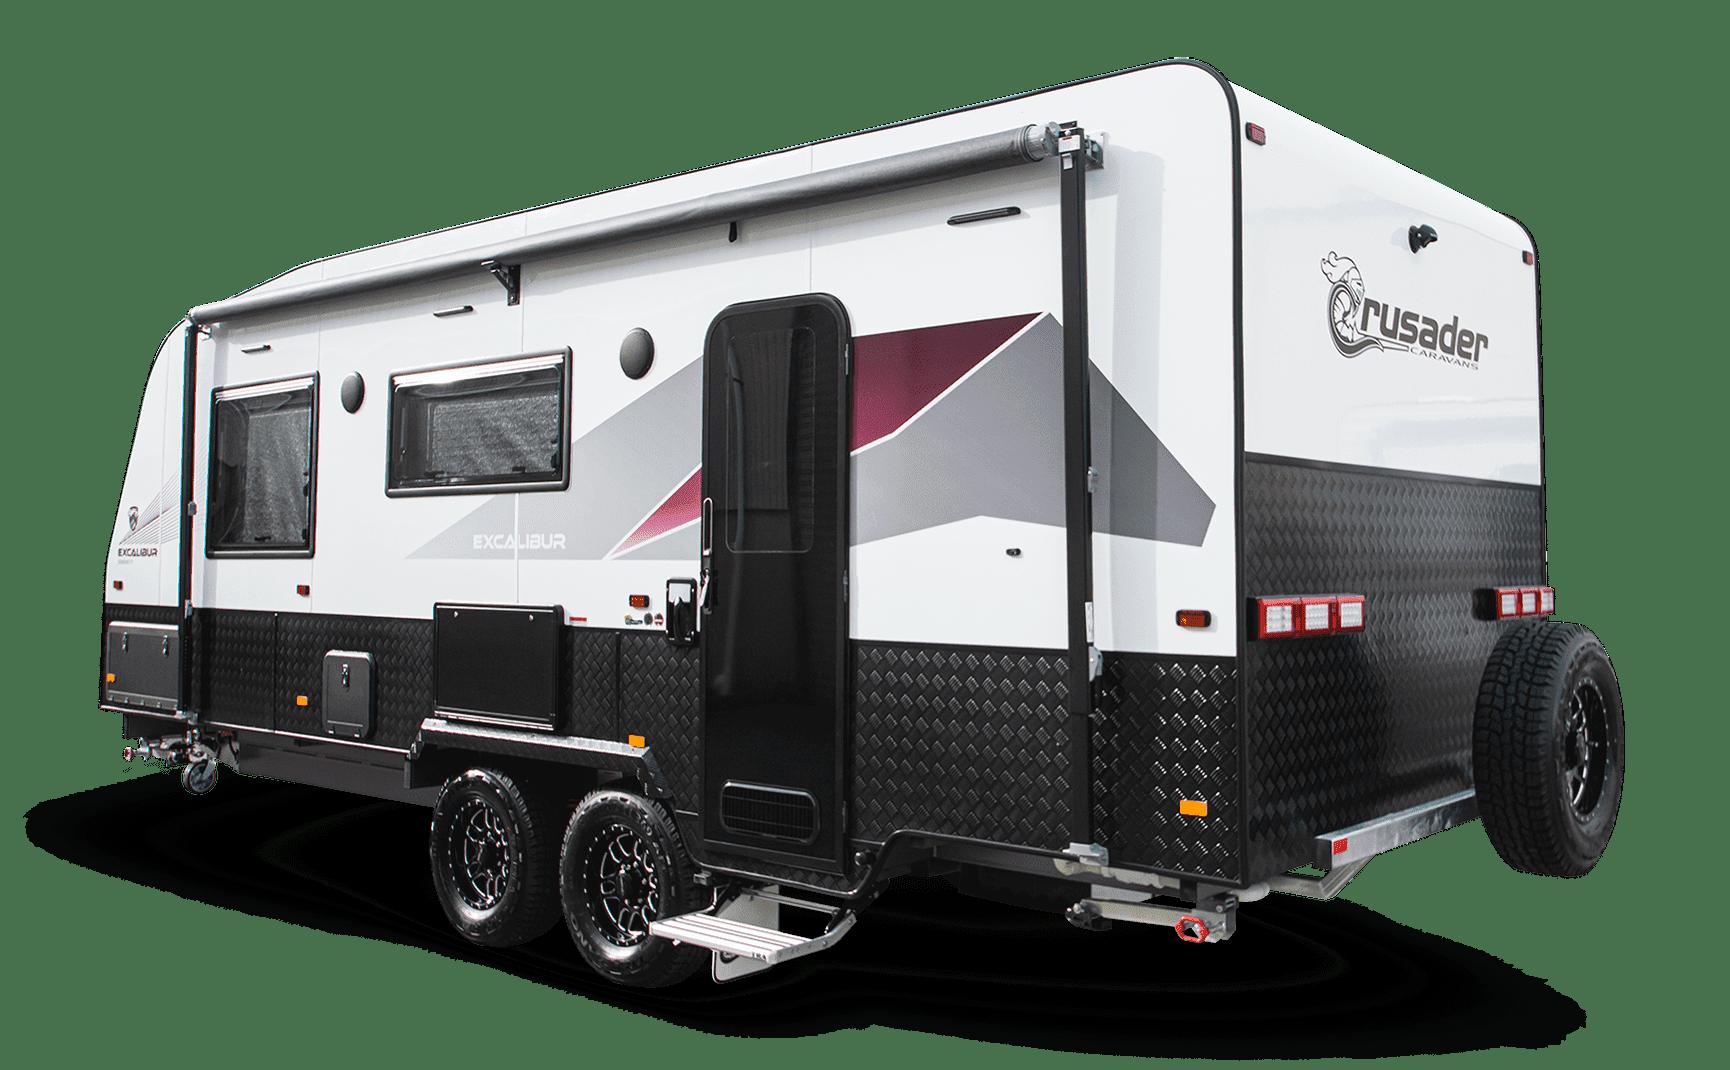 New Excalibur Serenity caravan for sale at Lewis RV.